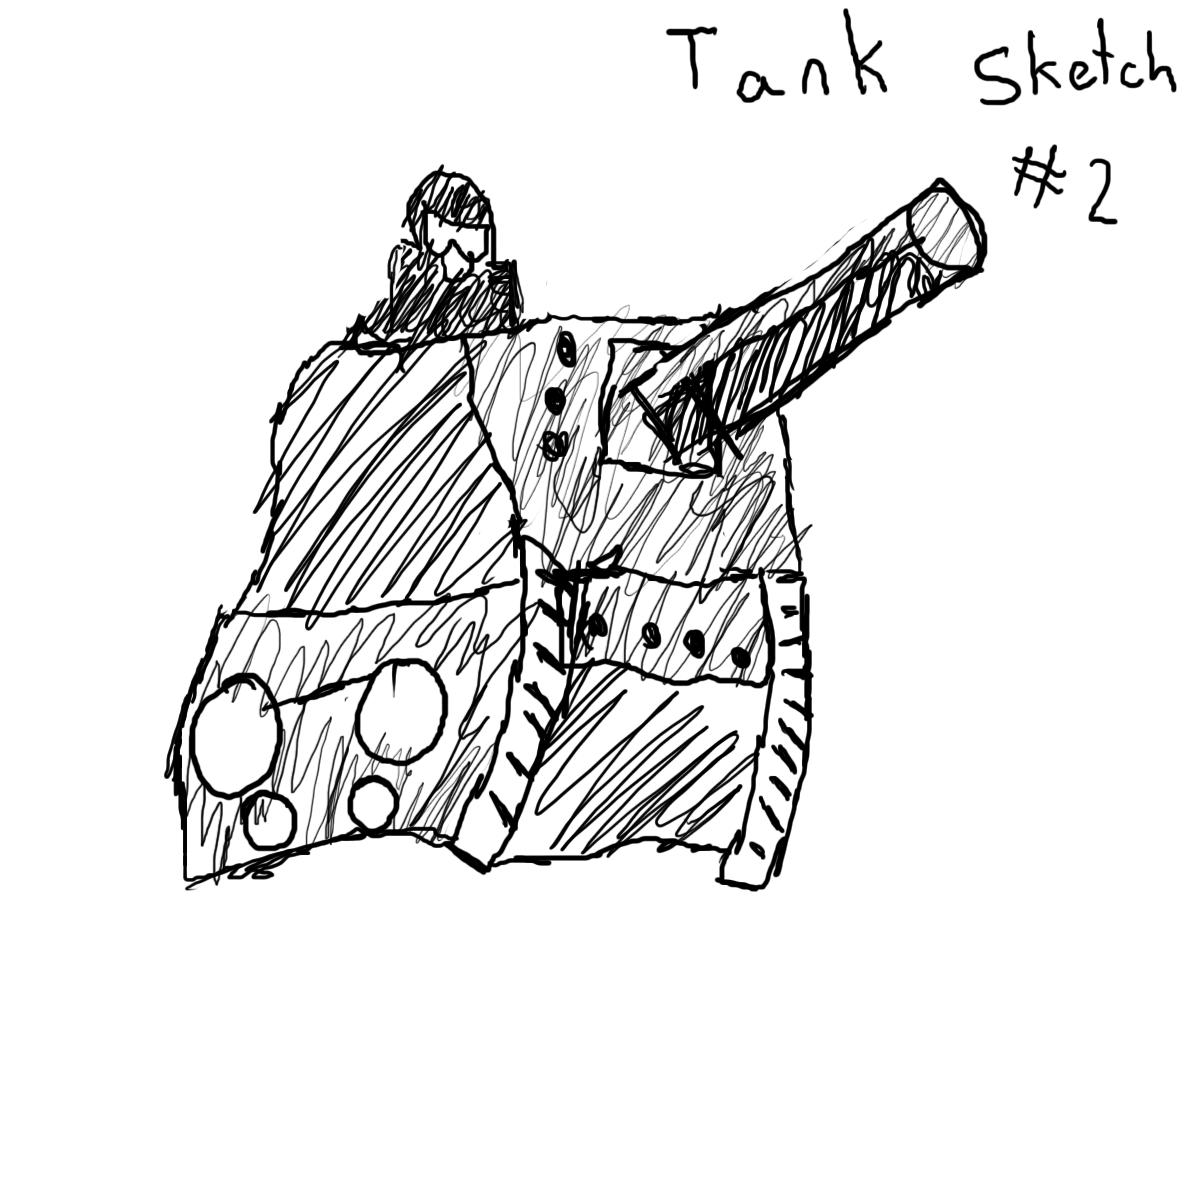 Tank Sketch #2